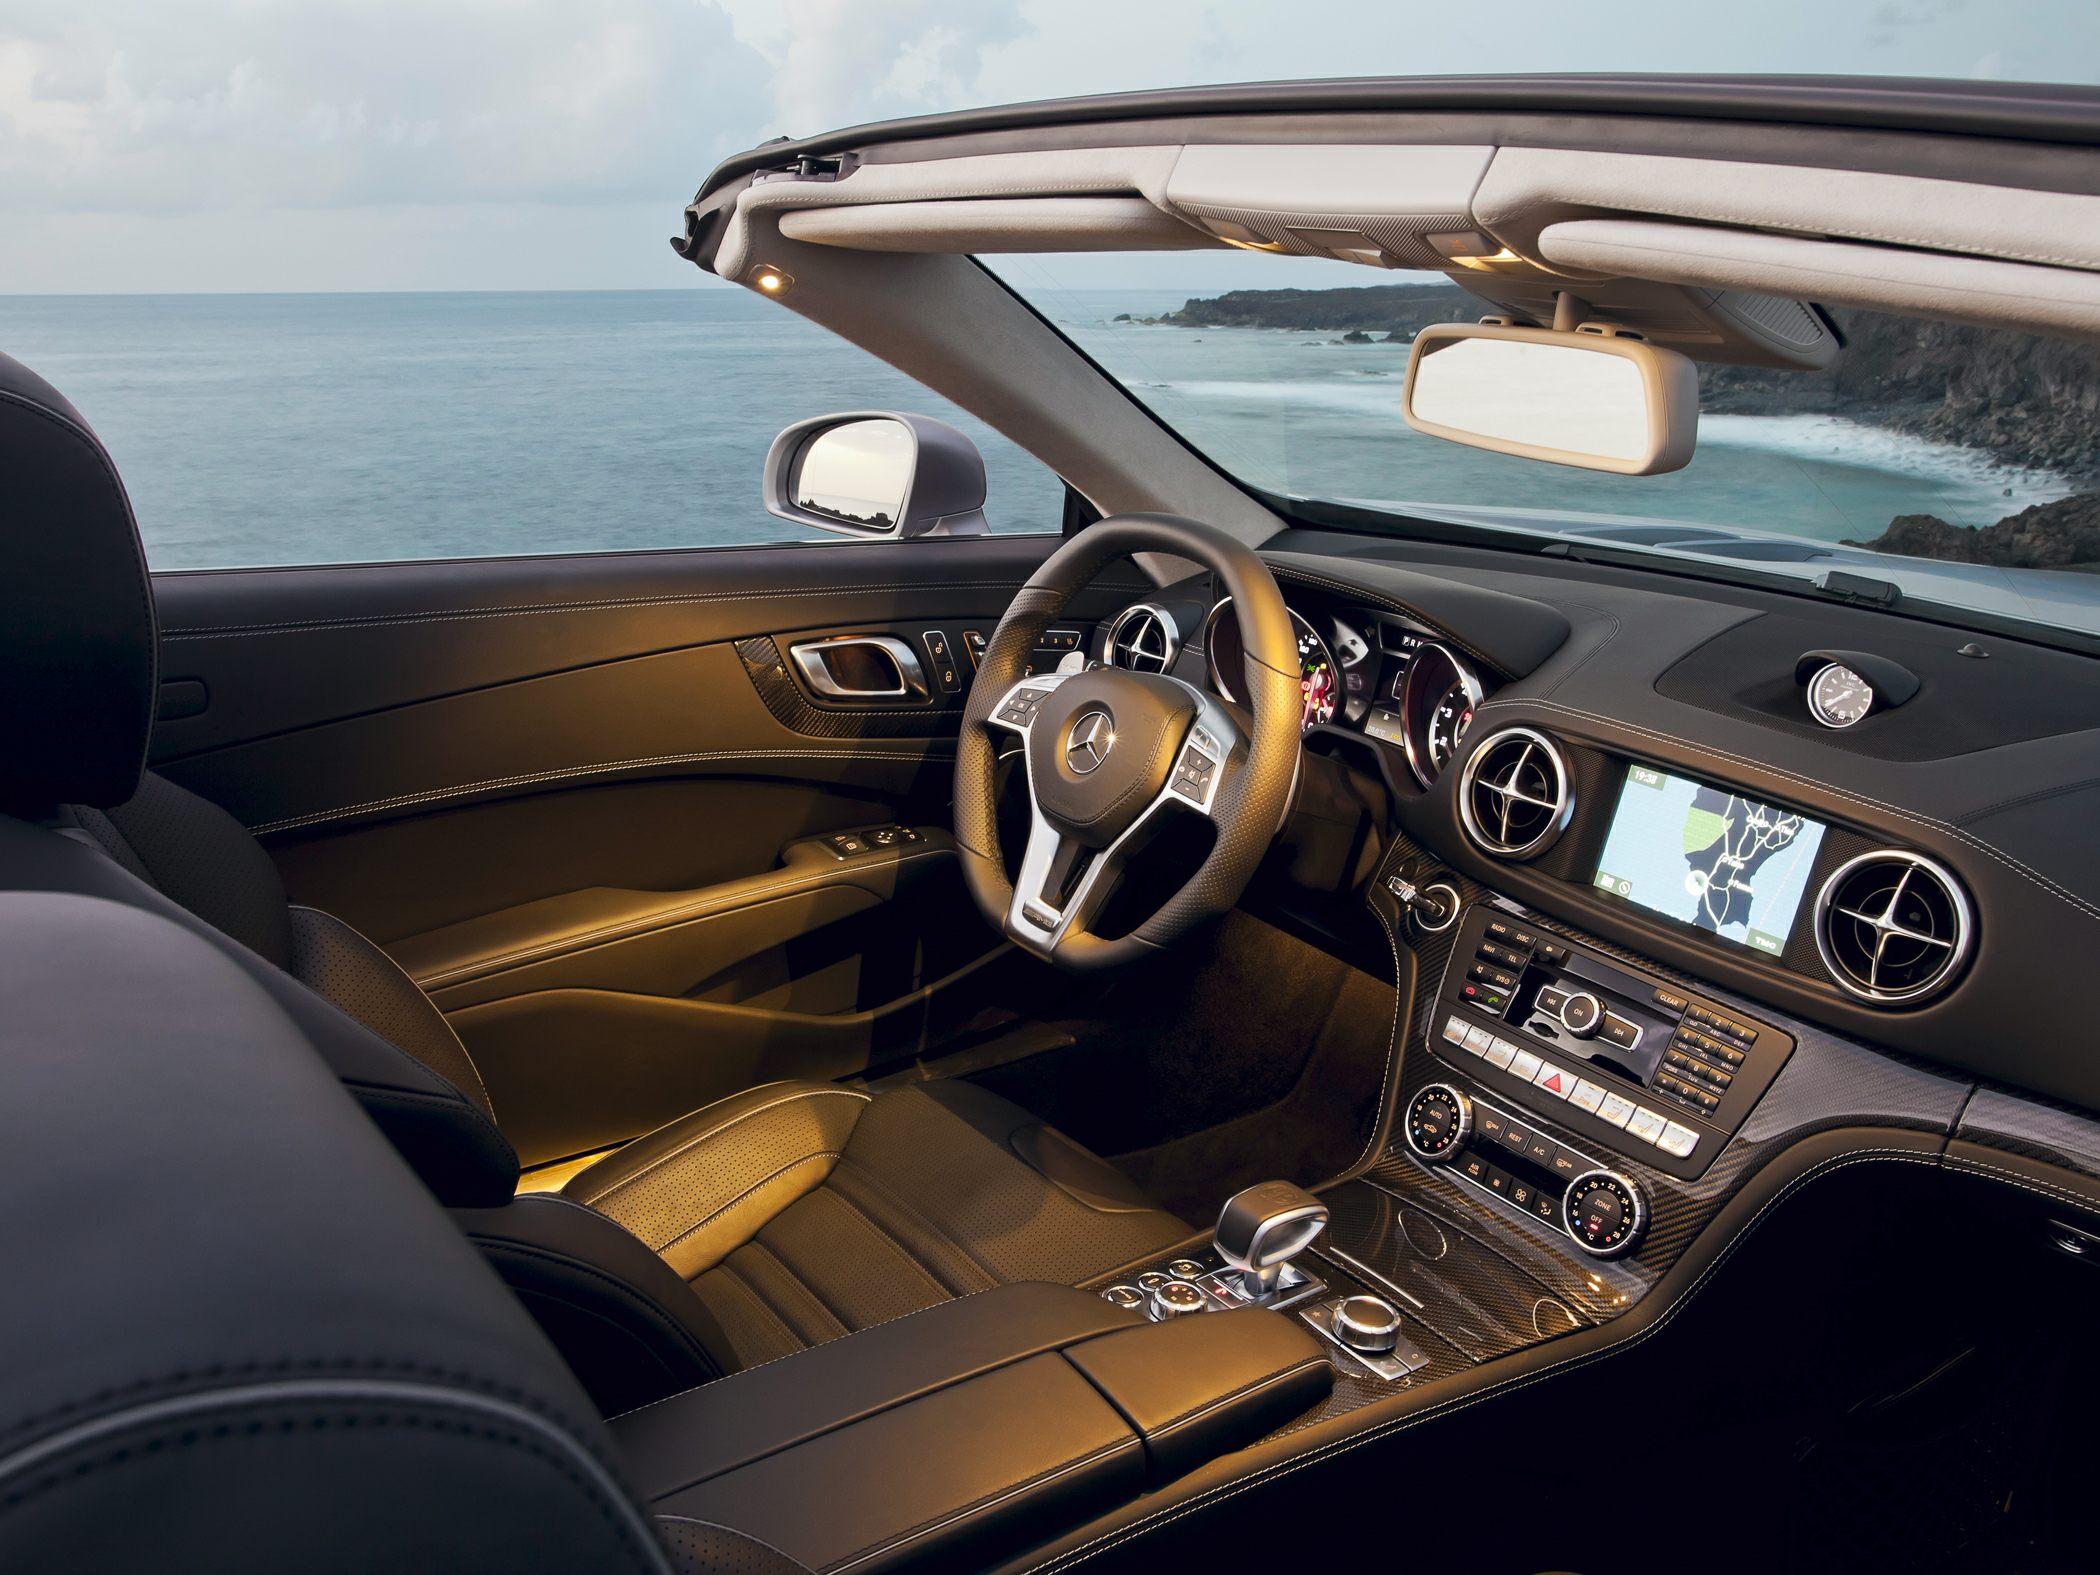 Benz Cl500 2015 2015 Mercedes-benz Sl63 Amg